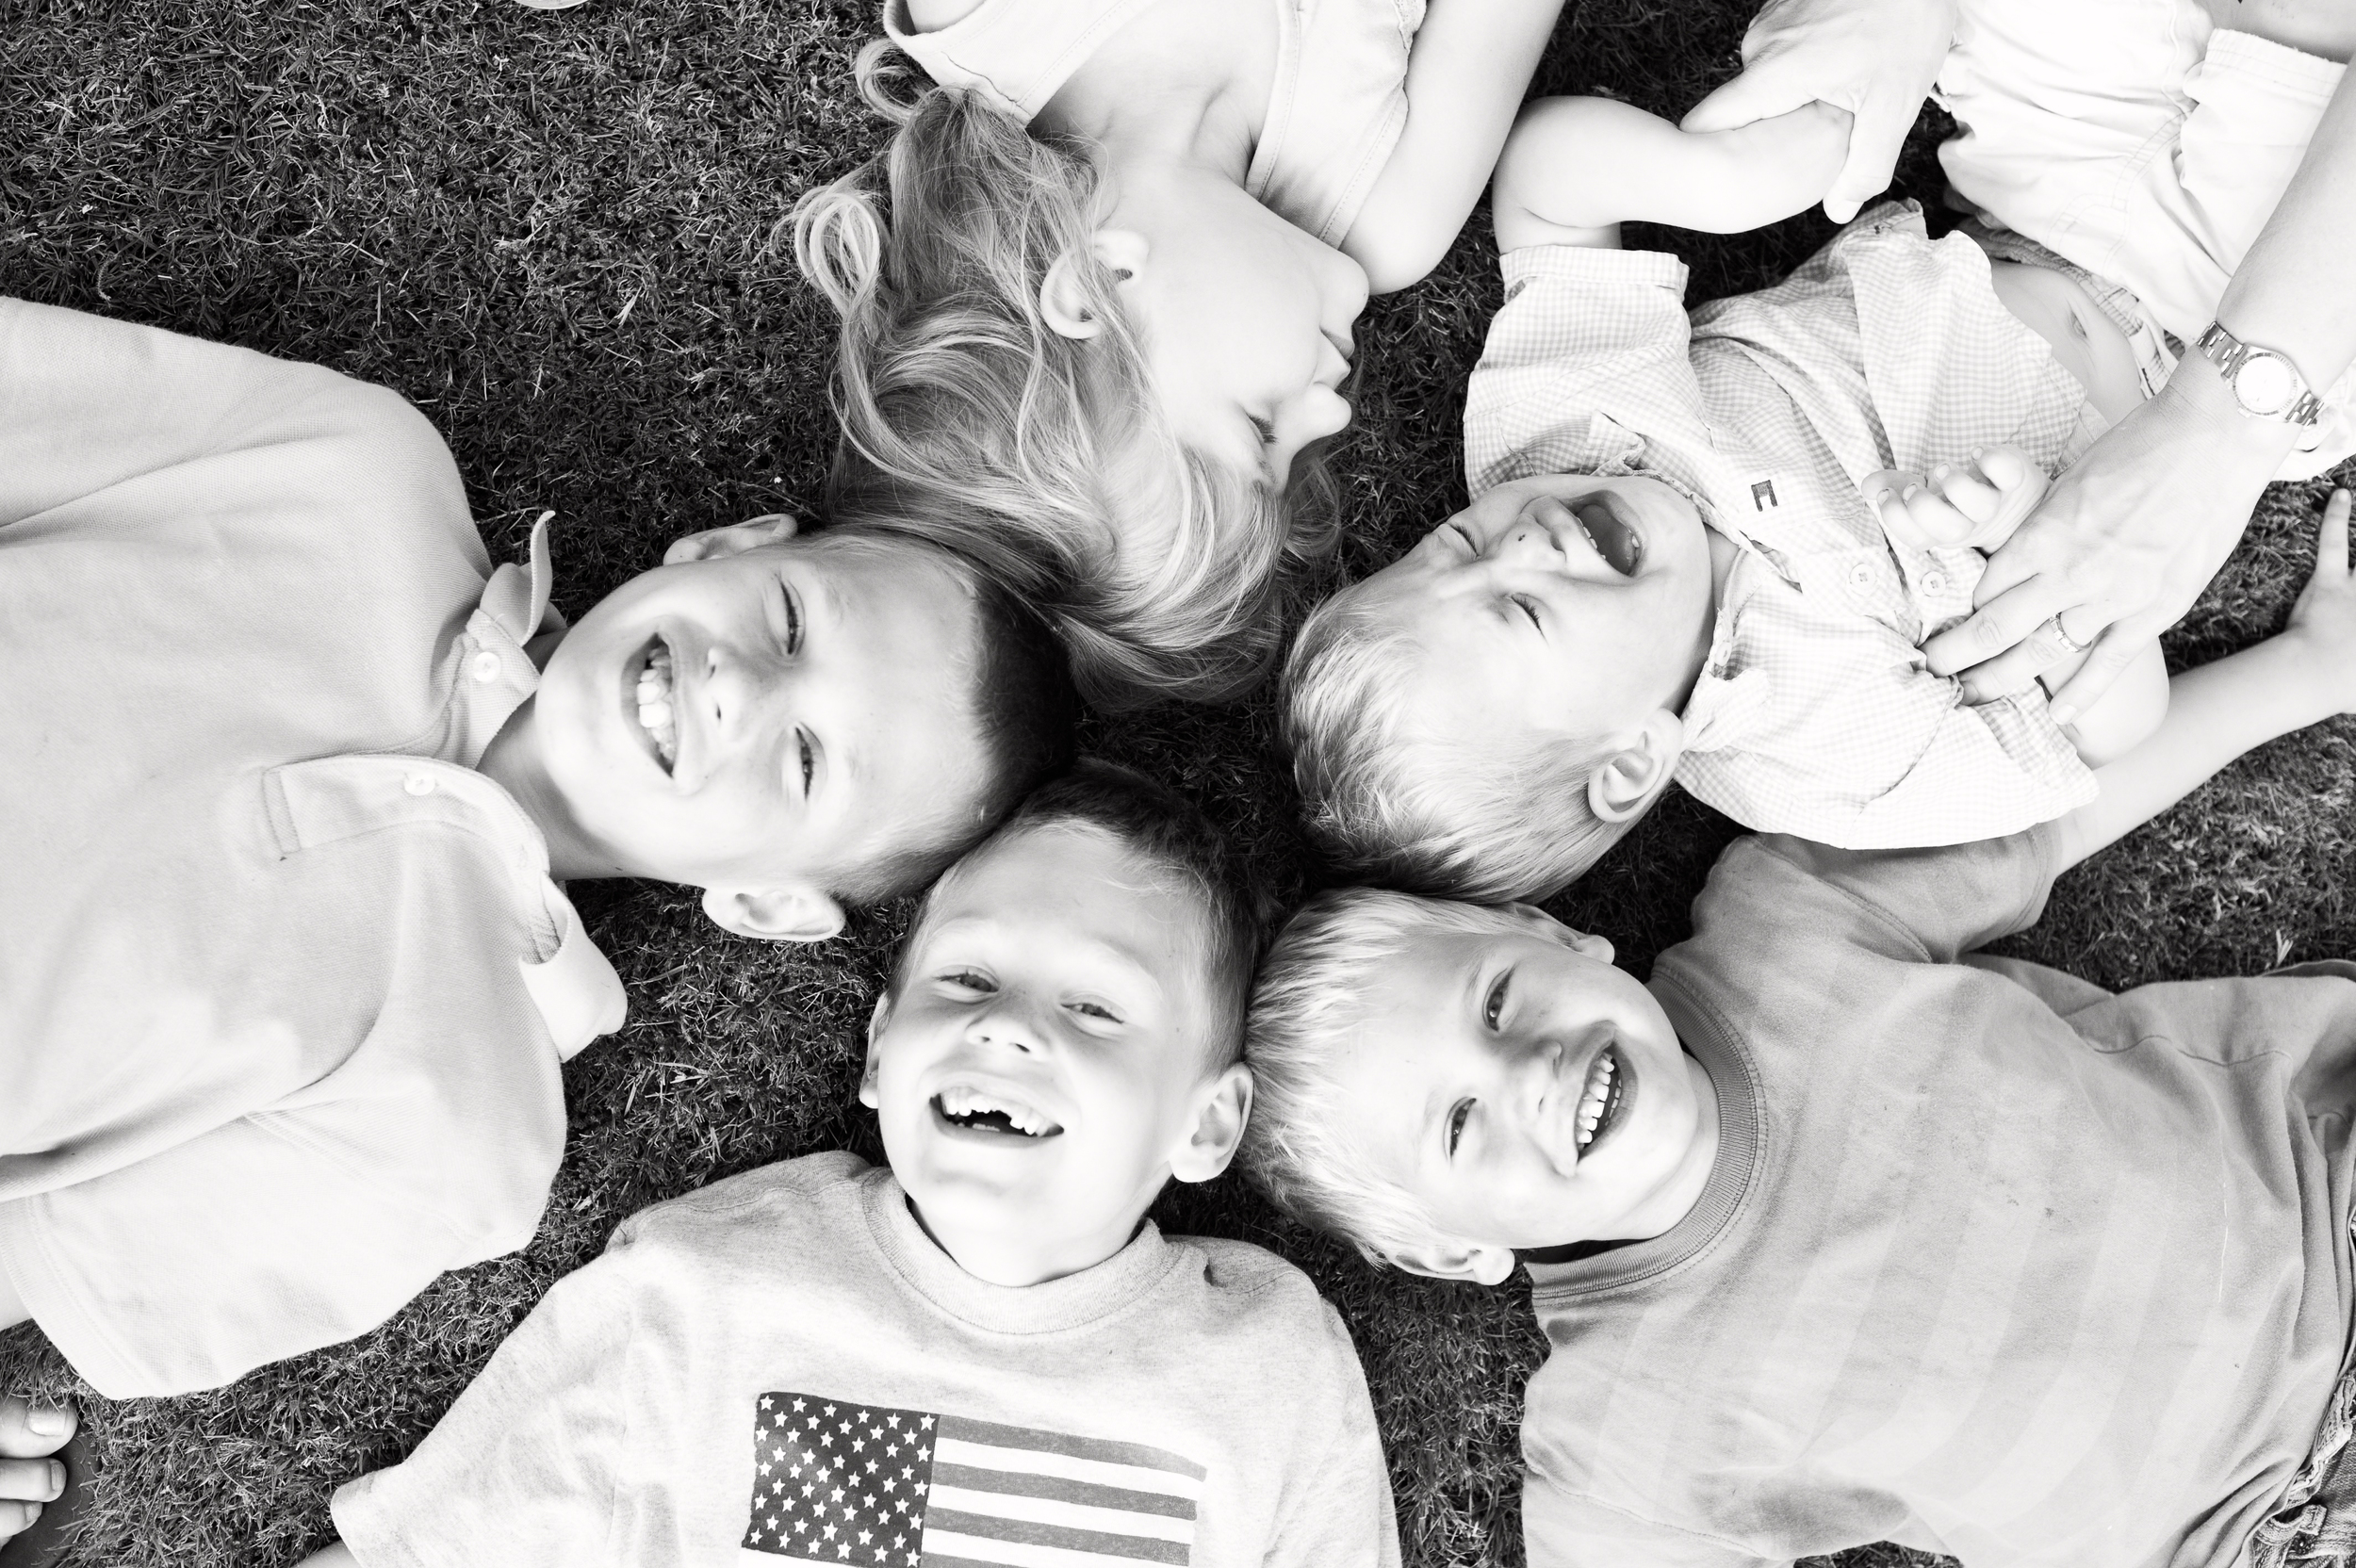 seattle-family-portrait-photographer-17.jpg